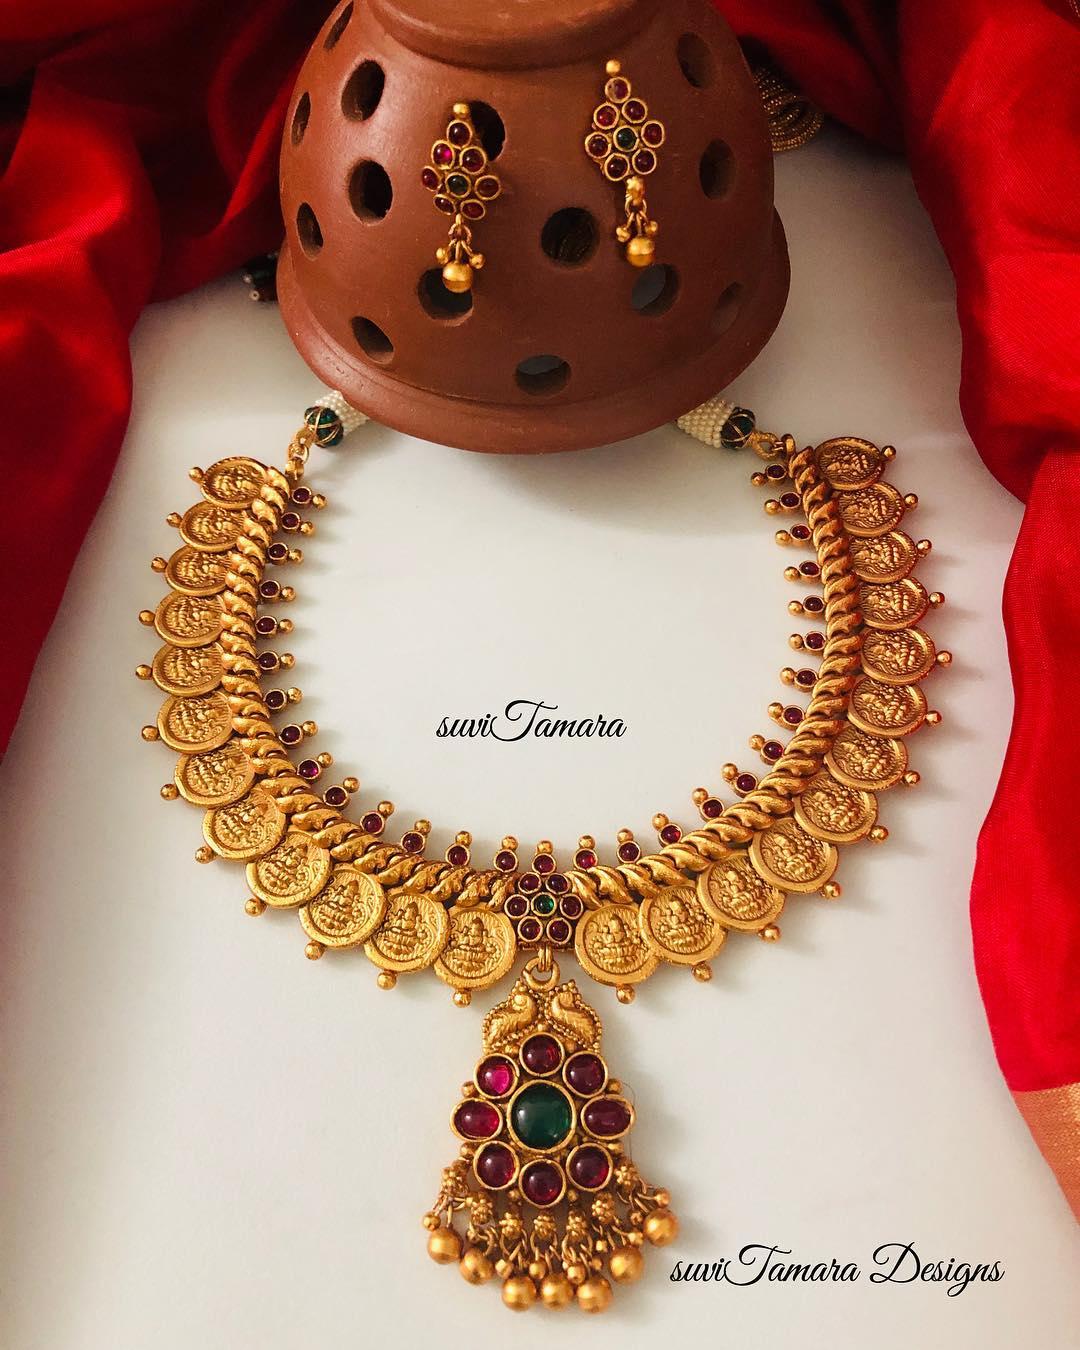 coin-necklace-designs-2019 (10)